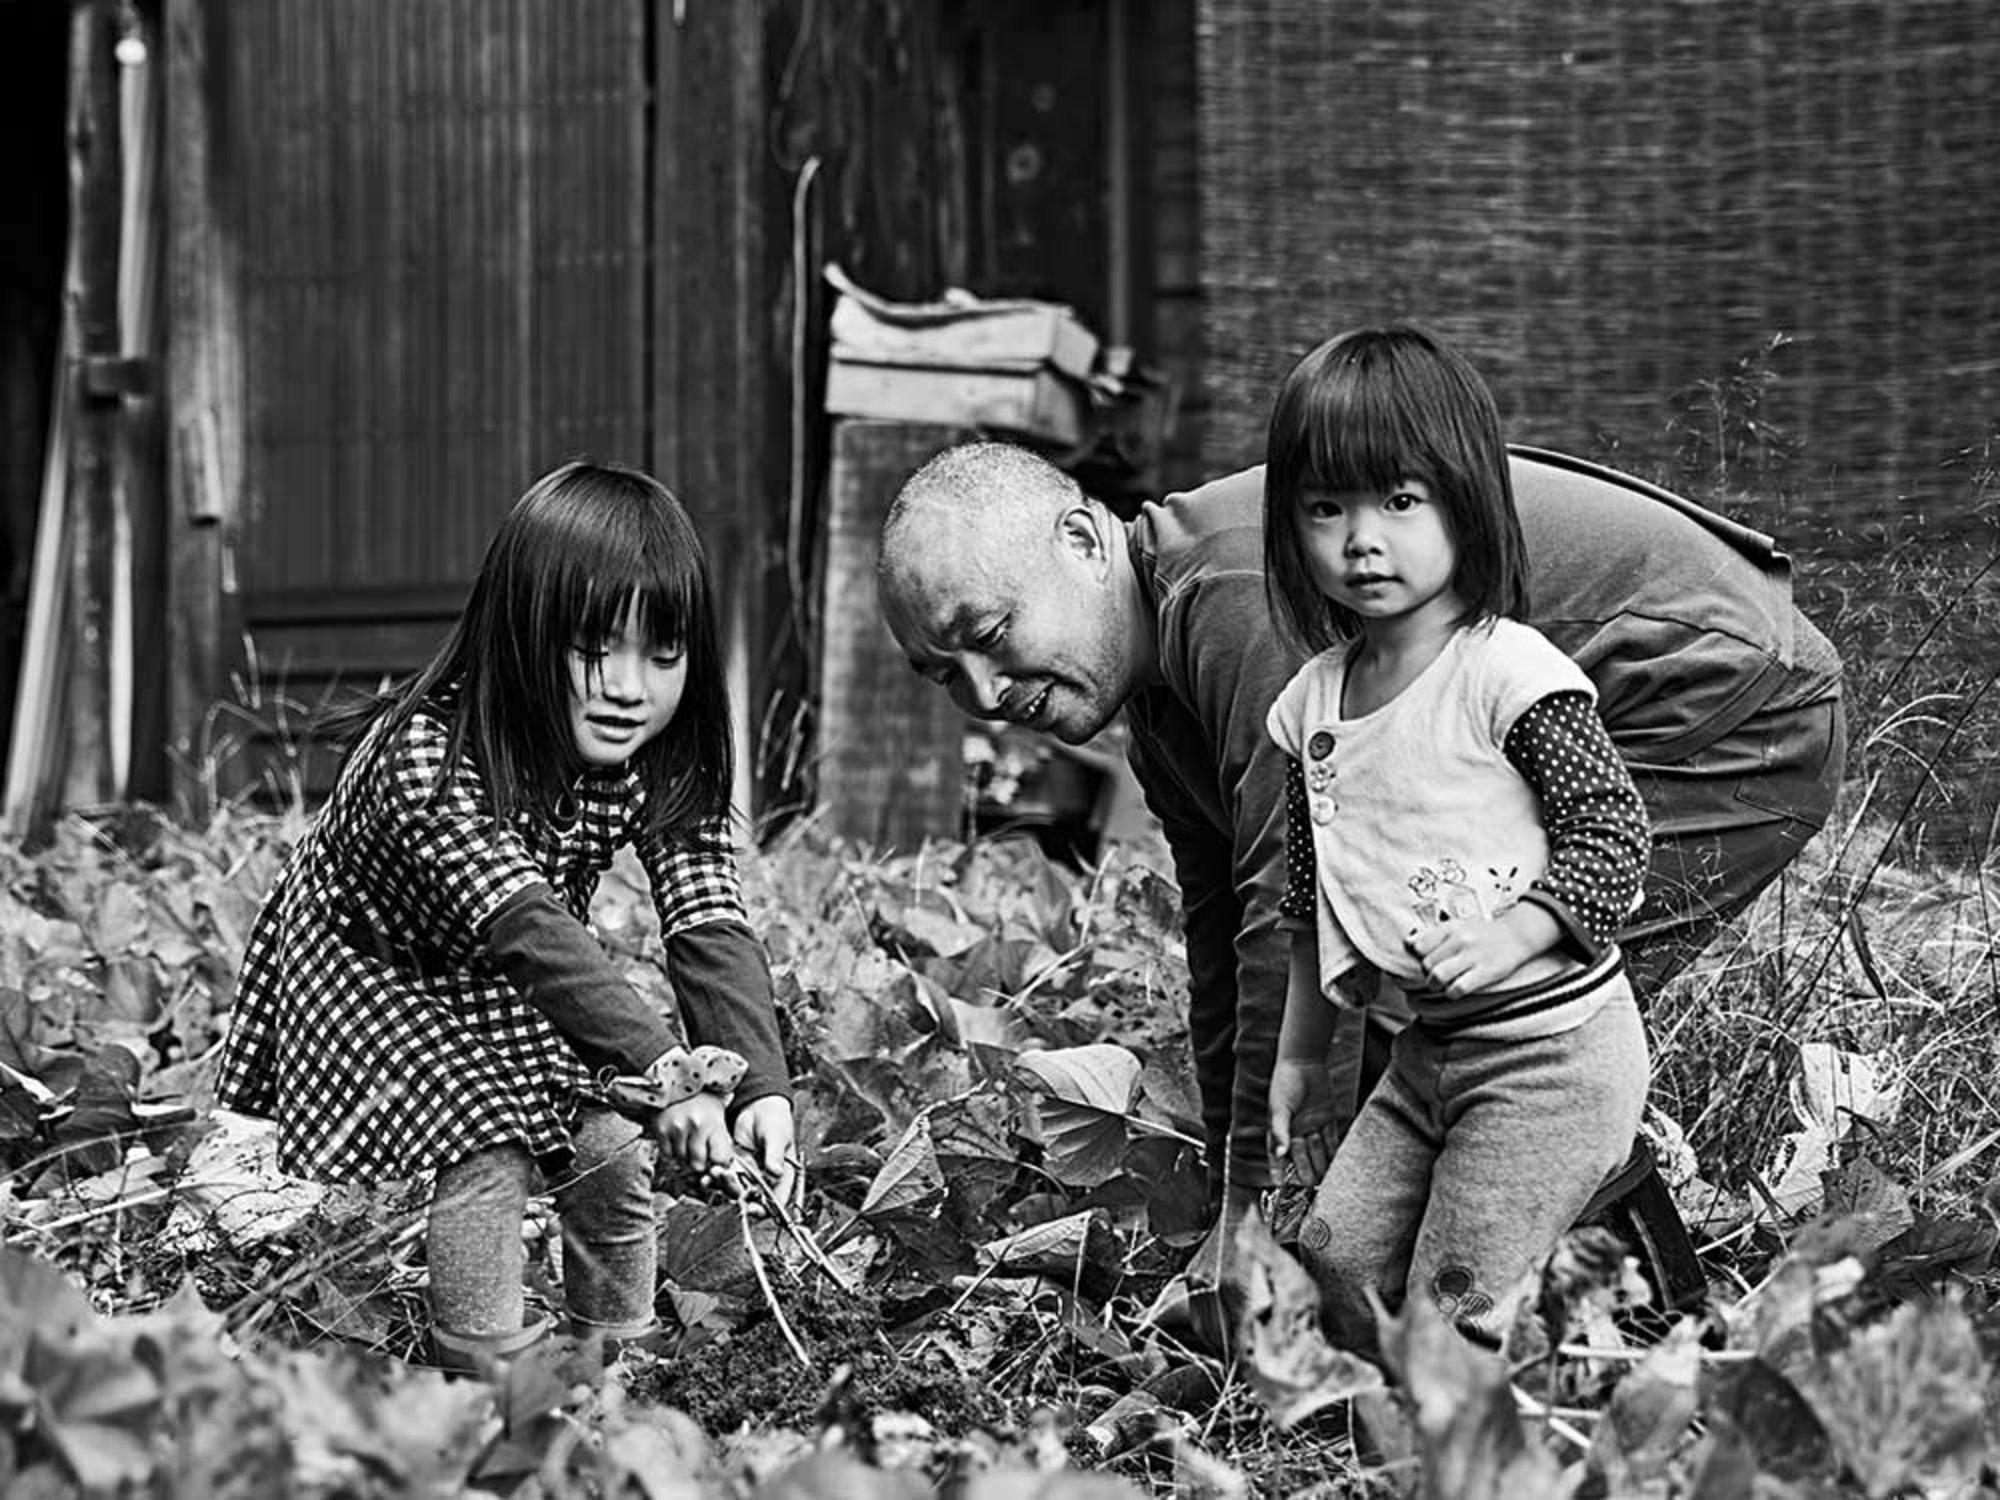 kyoto_harvest-sweet-potatoes_1000x750.jpg